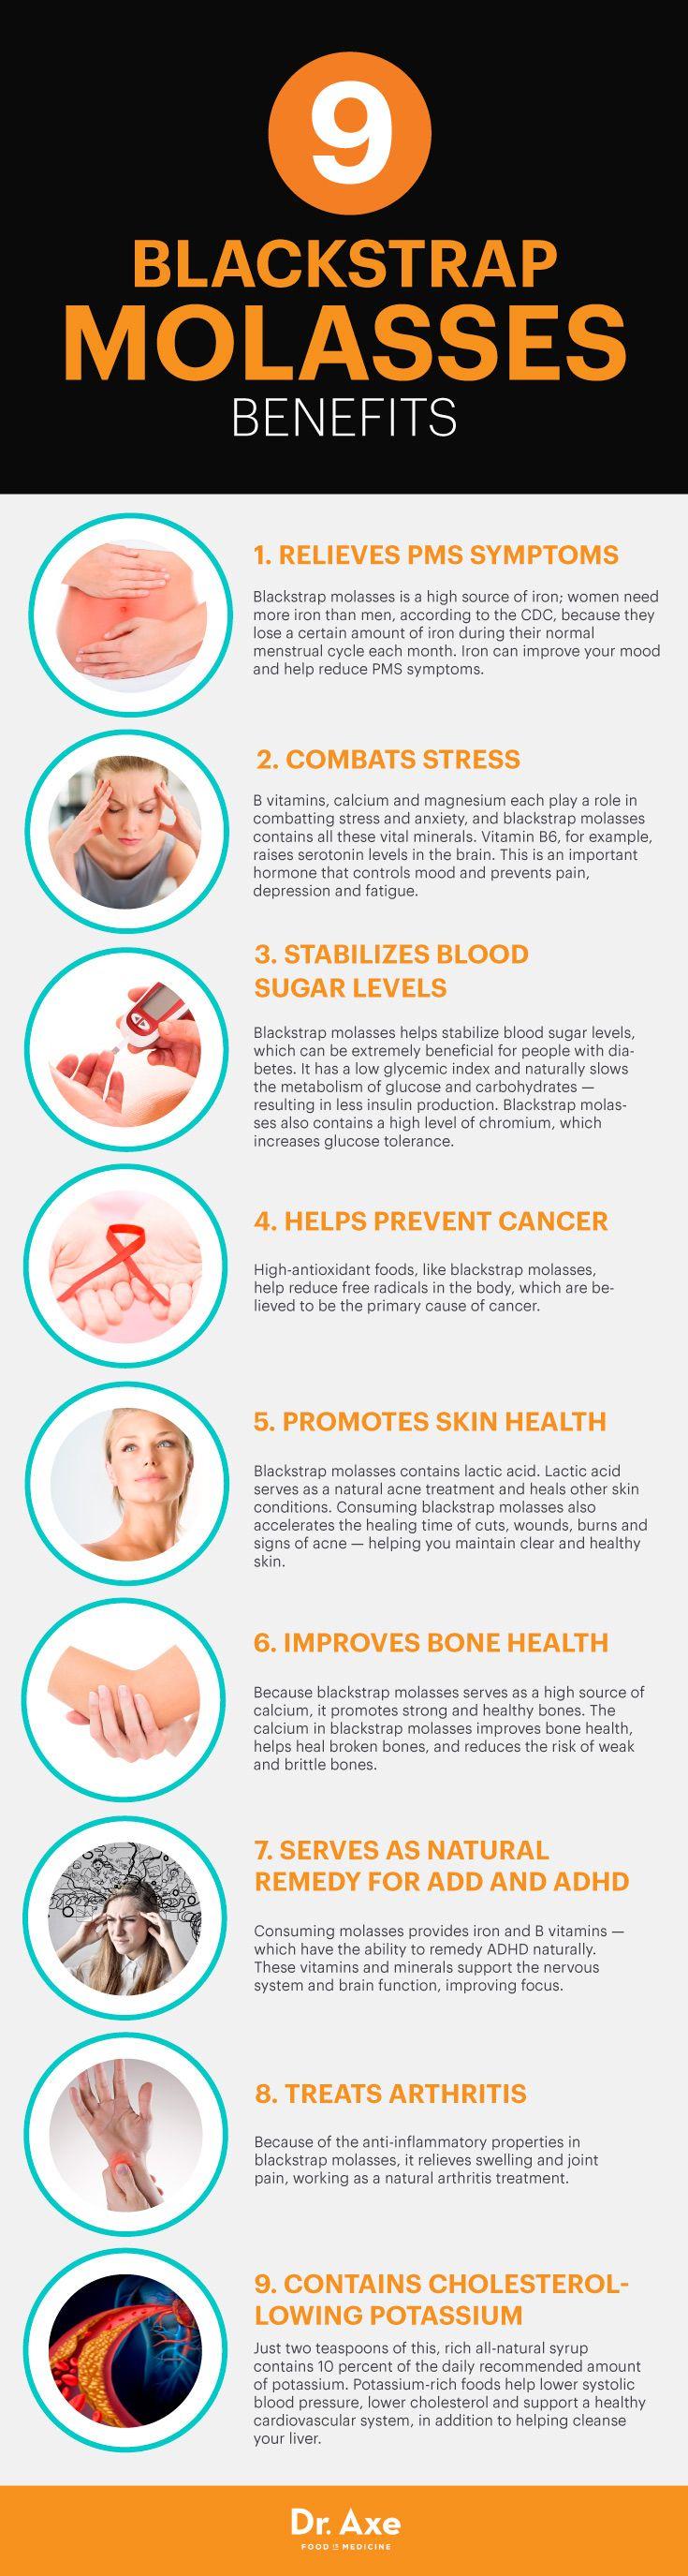 Blackstrap molasses benefits - Dr. Axe http://www.draxe.com #health #holistic #natural